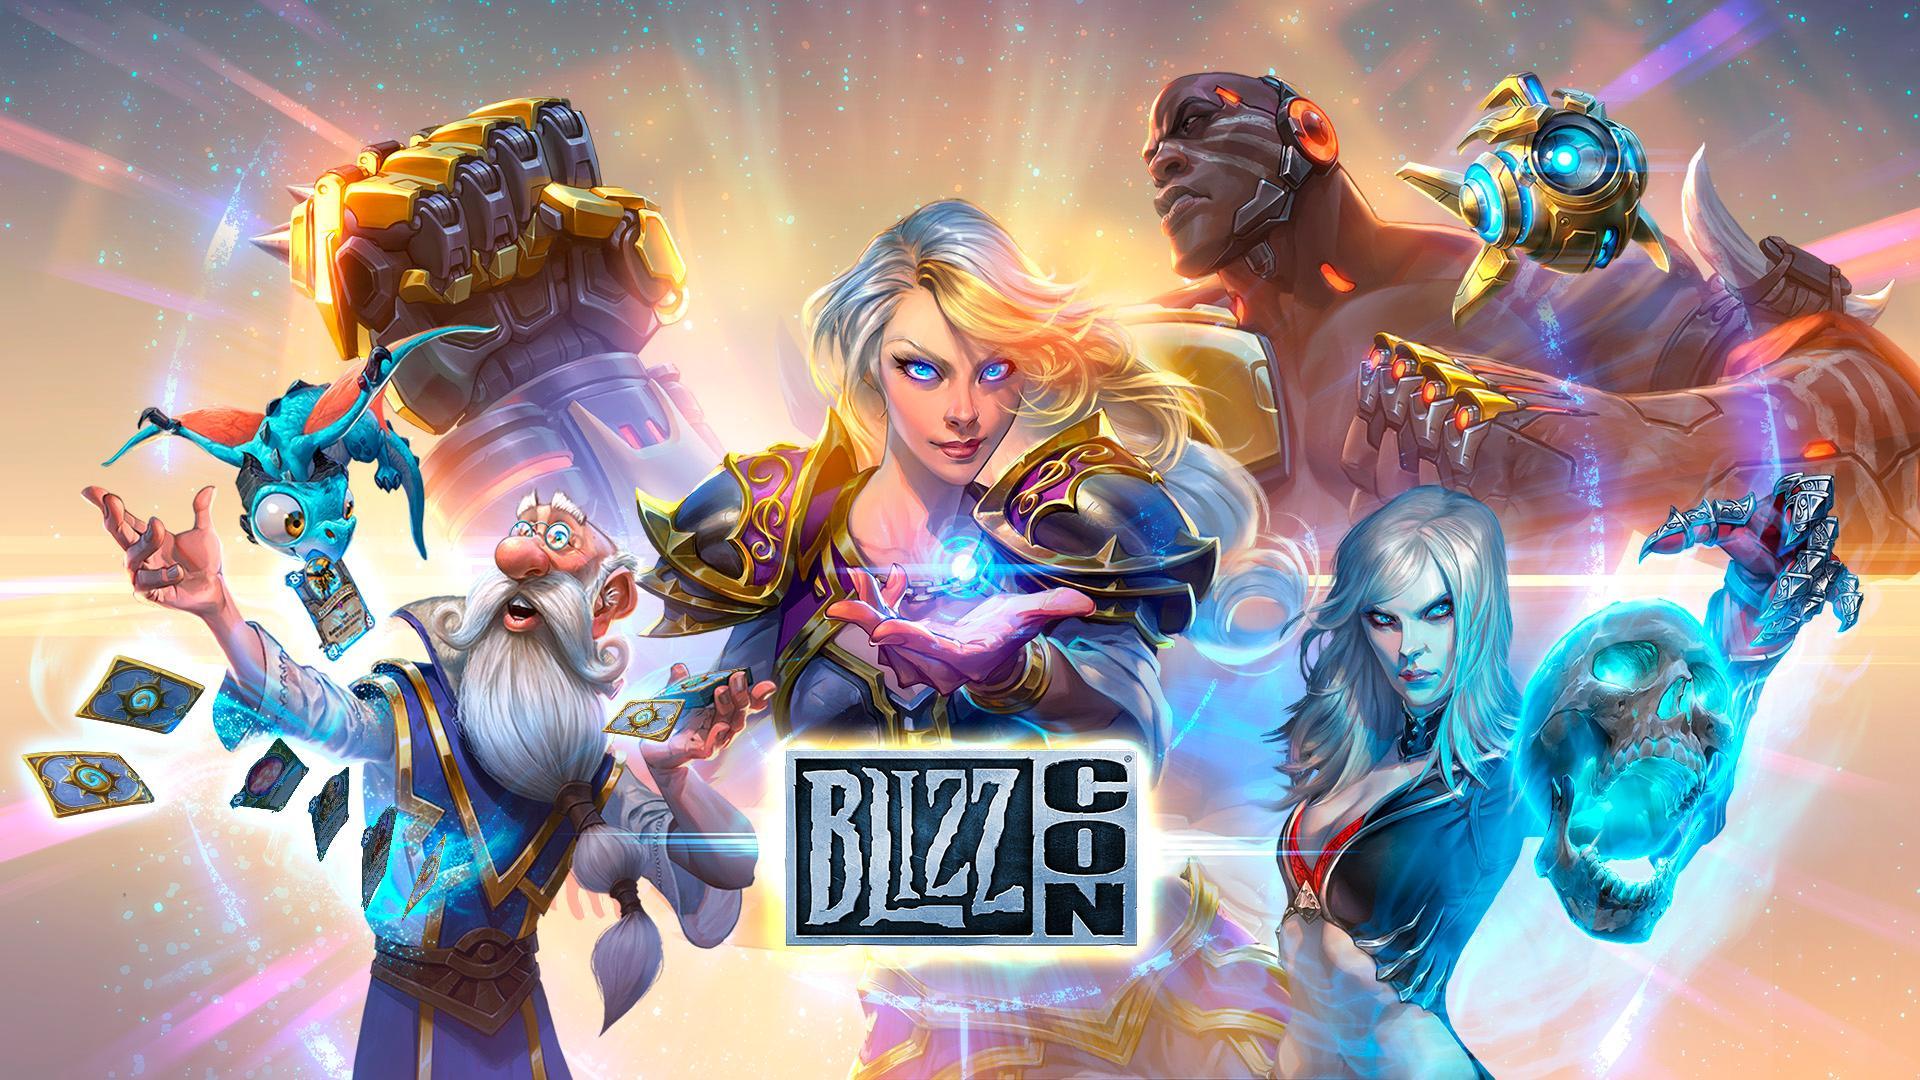 Blizzard, BlizzCon 2018